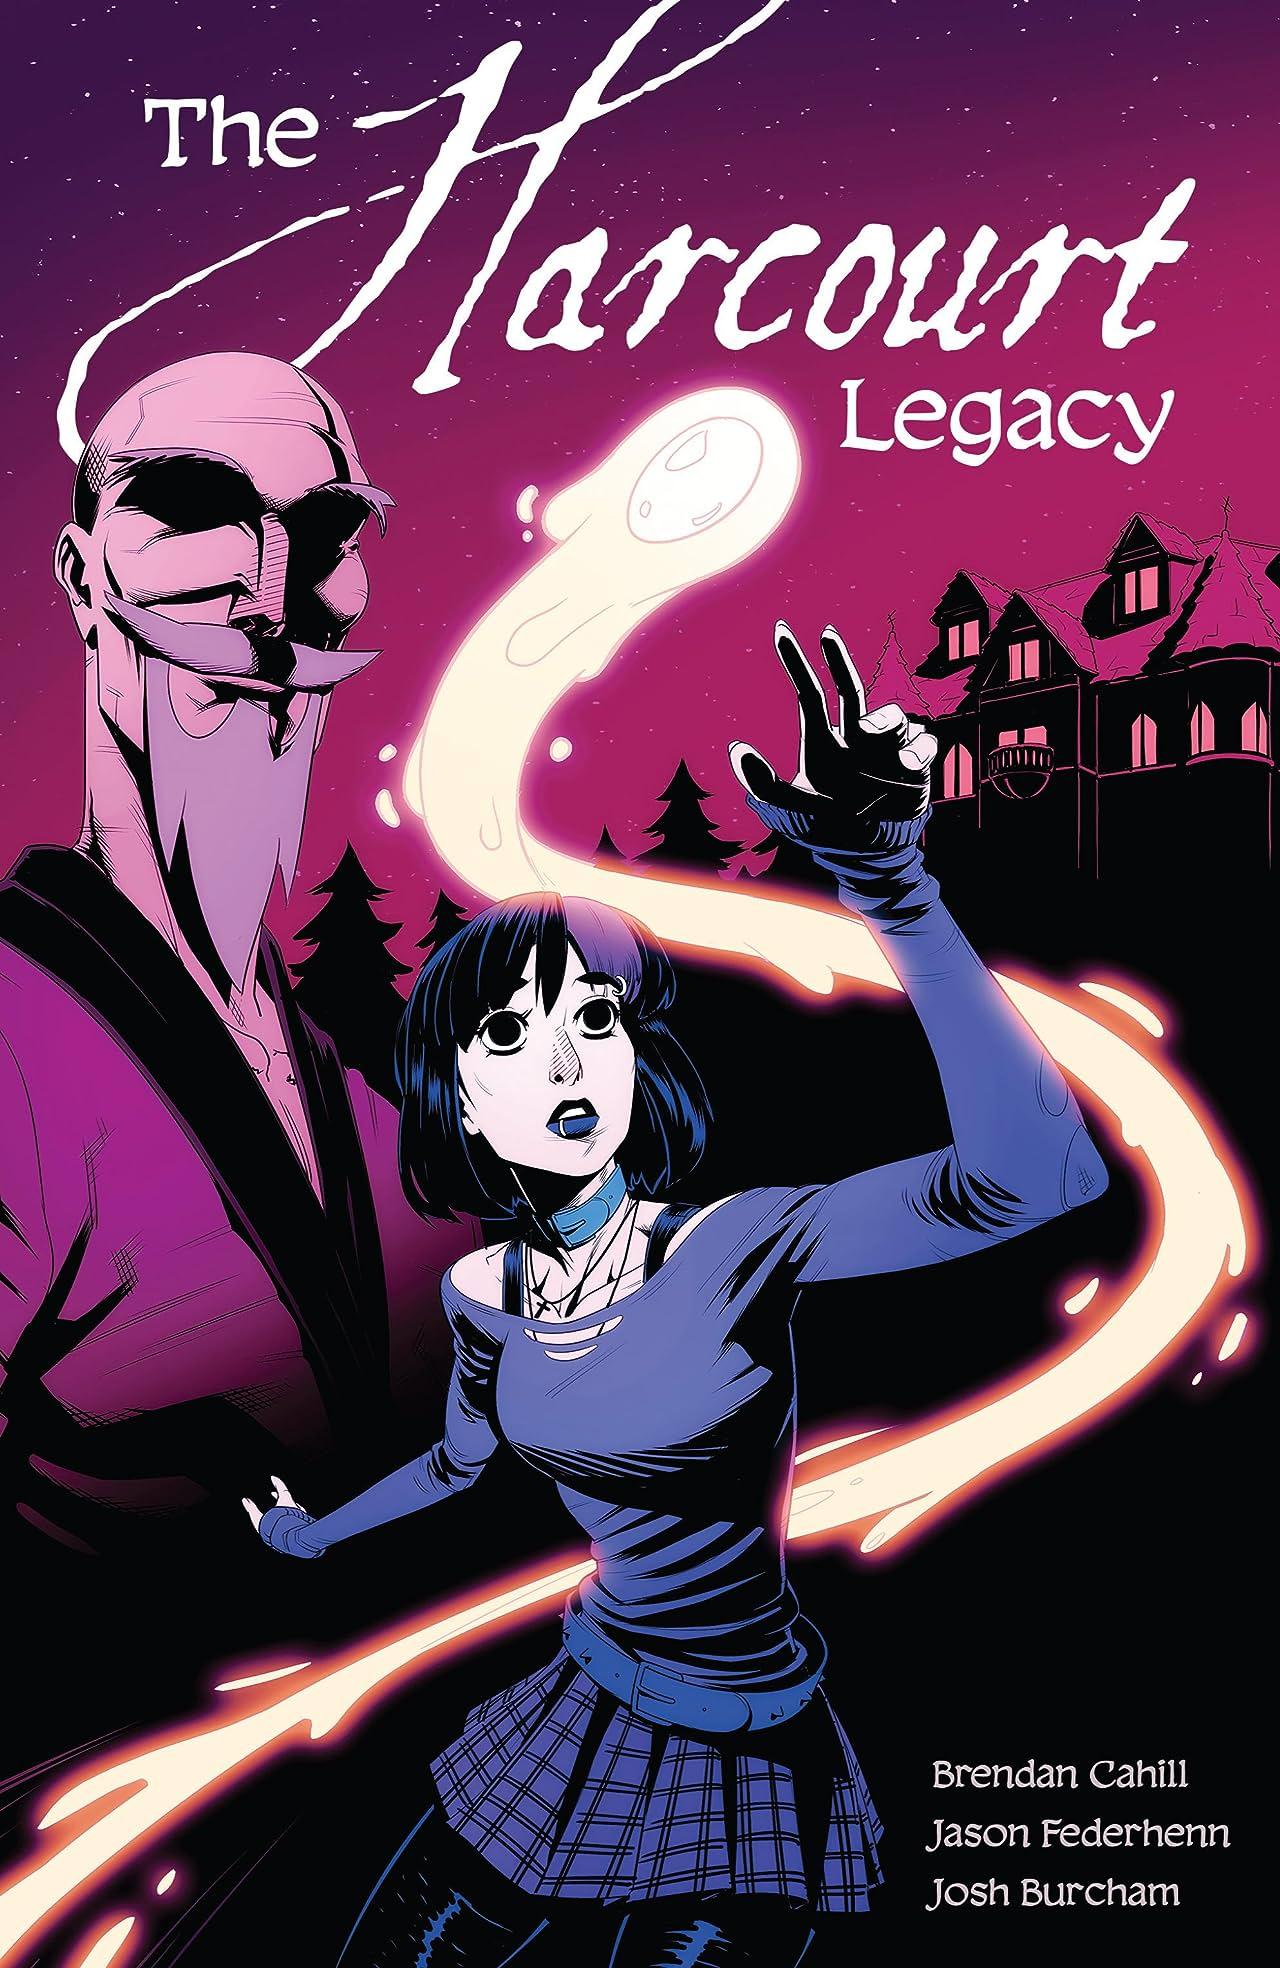 The Harcourt Legacy Vol. 1